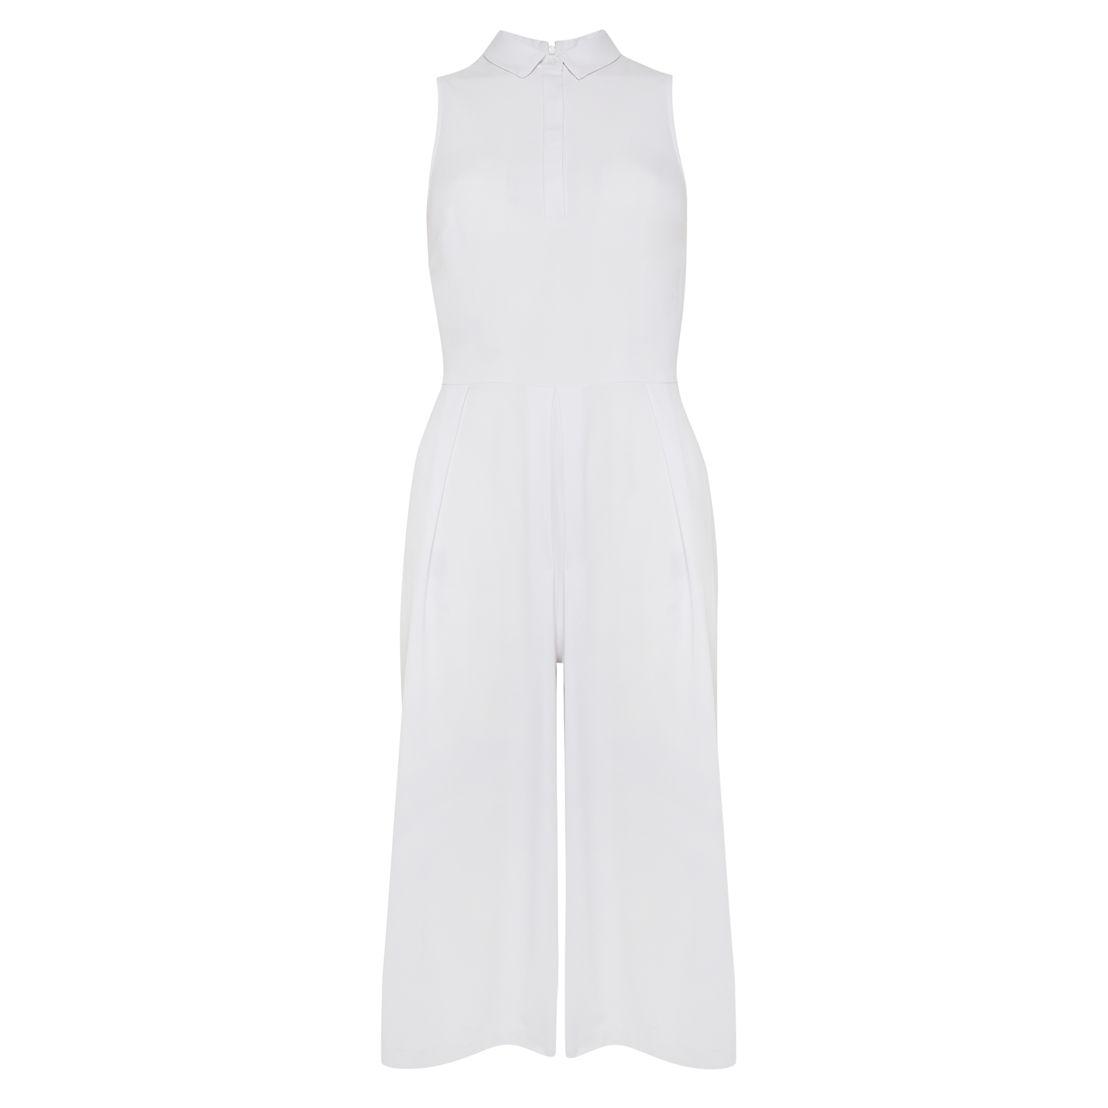 Primark - White culotte jumpsuit - 16€